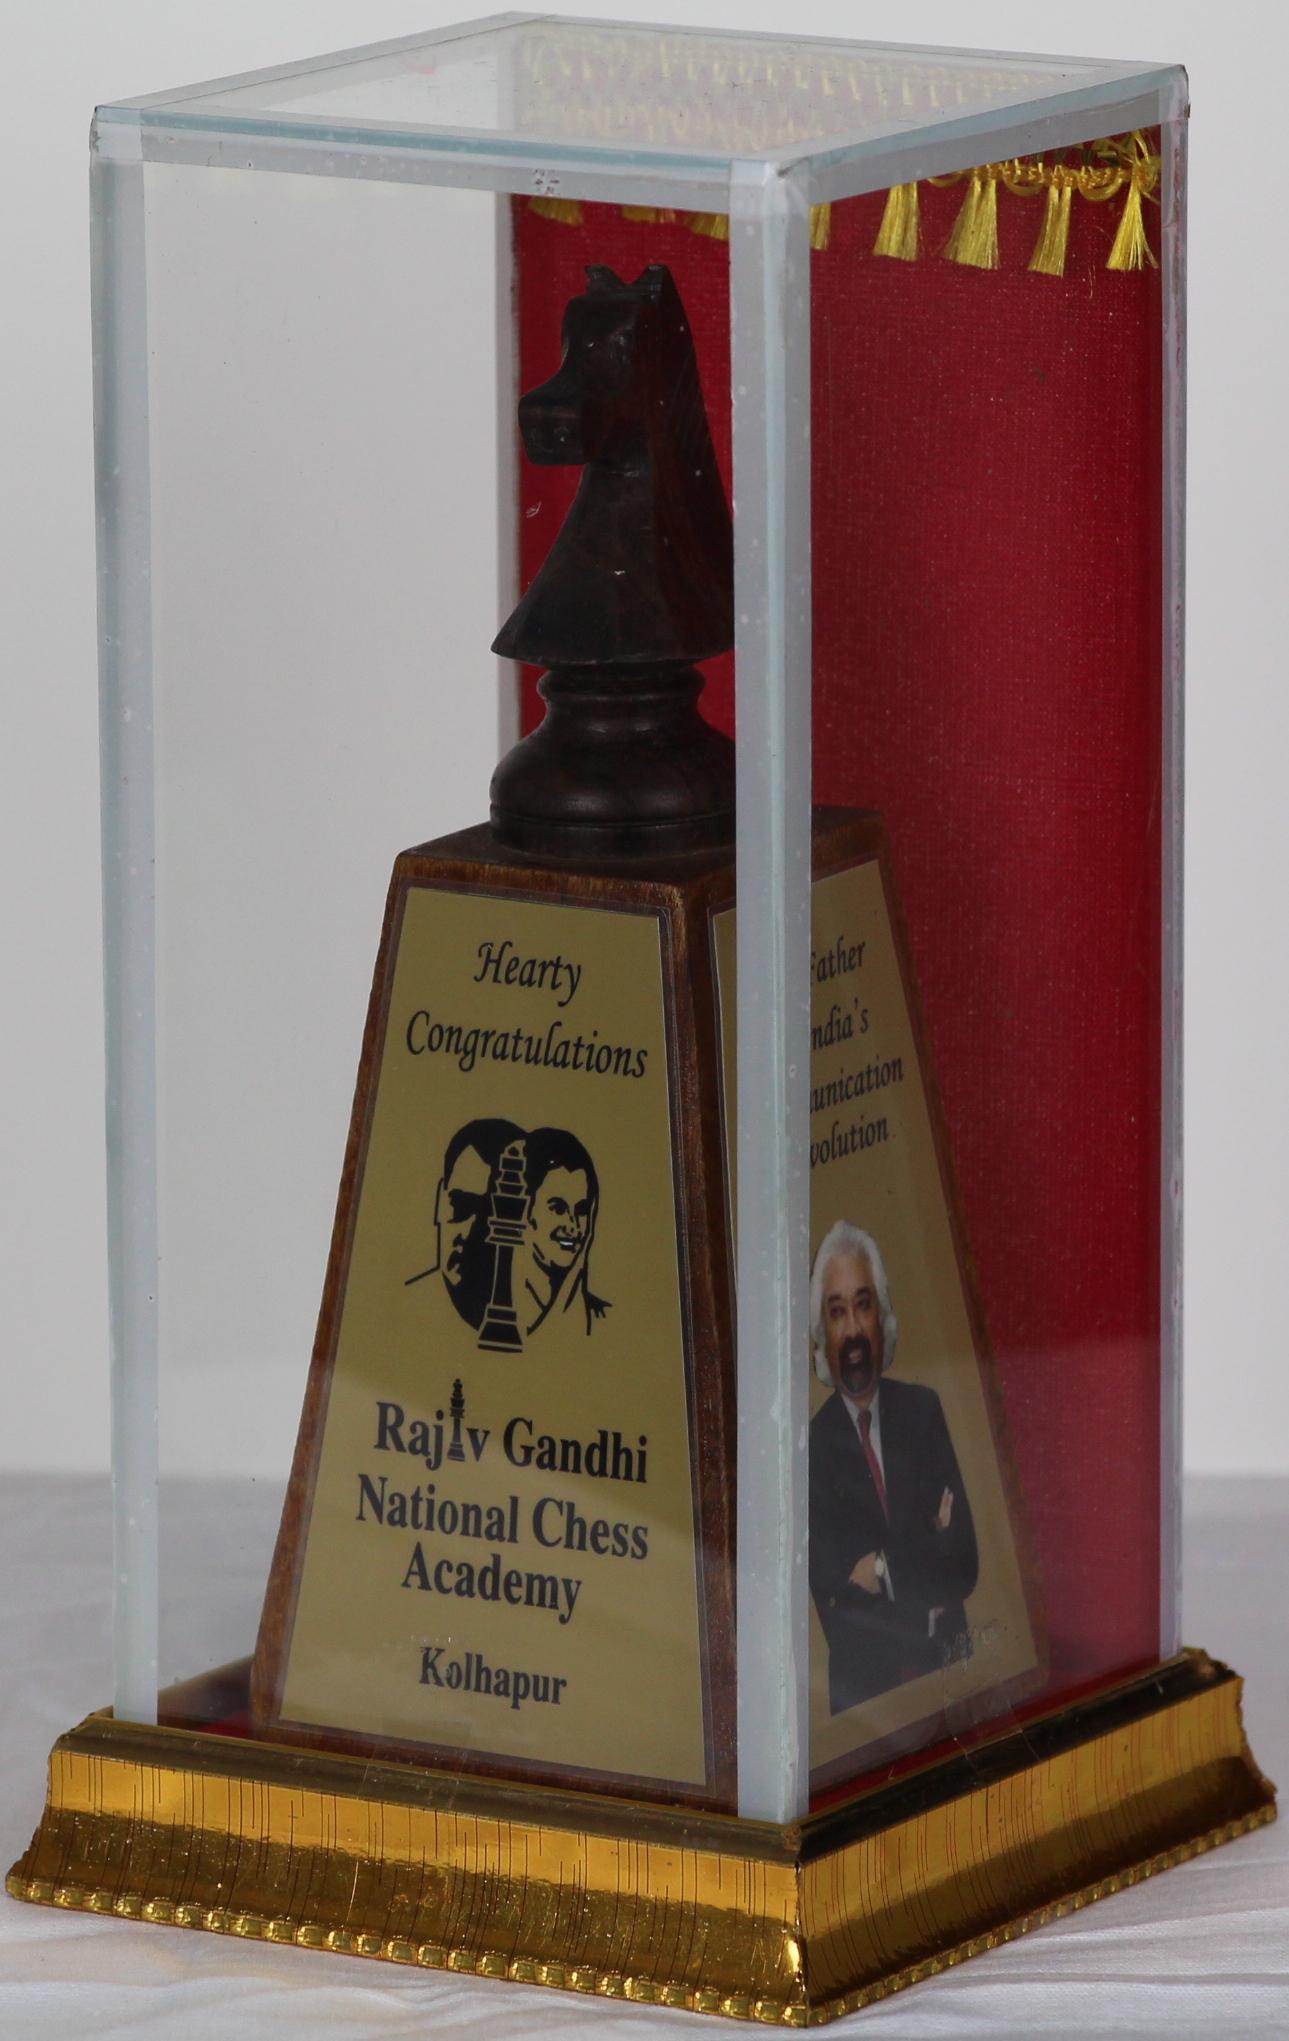 Award of Appreciation, Rajiv Gandhi National Chess Academy, Kanpur